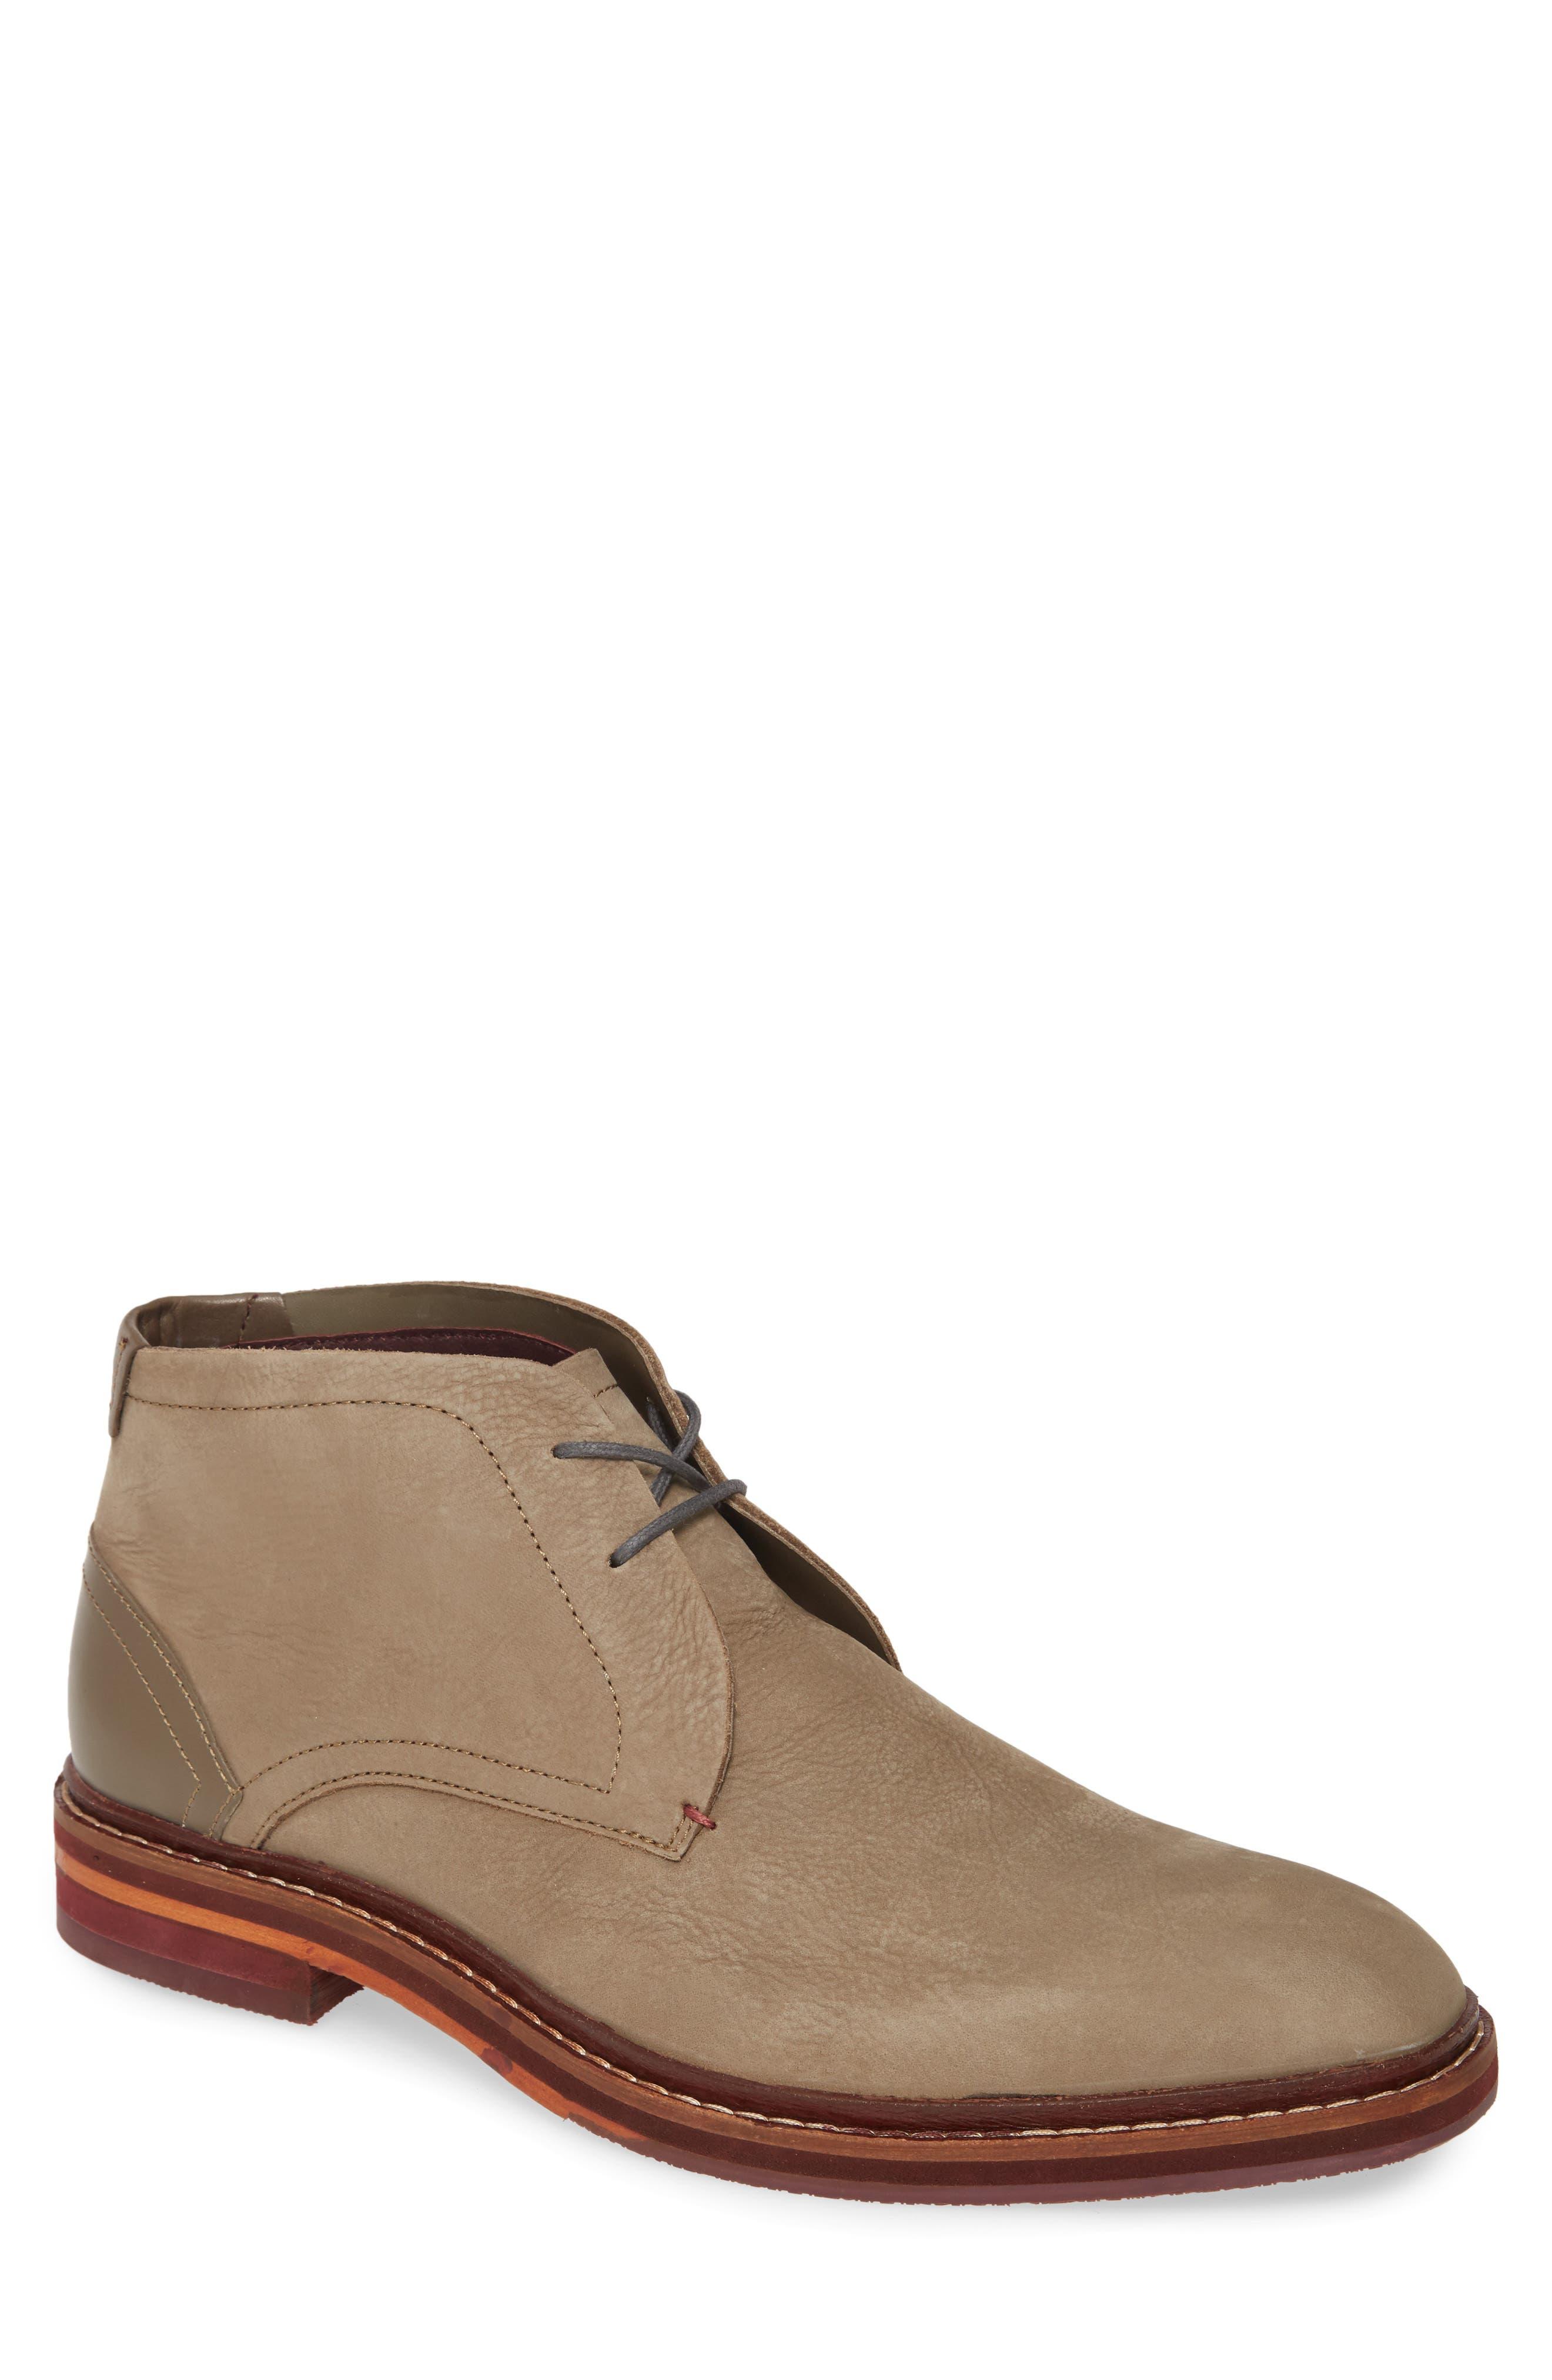 Ted Baker London Delighn Chukka Boot, Grey